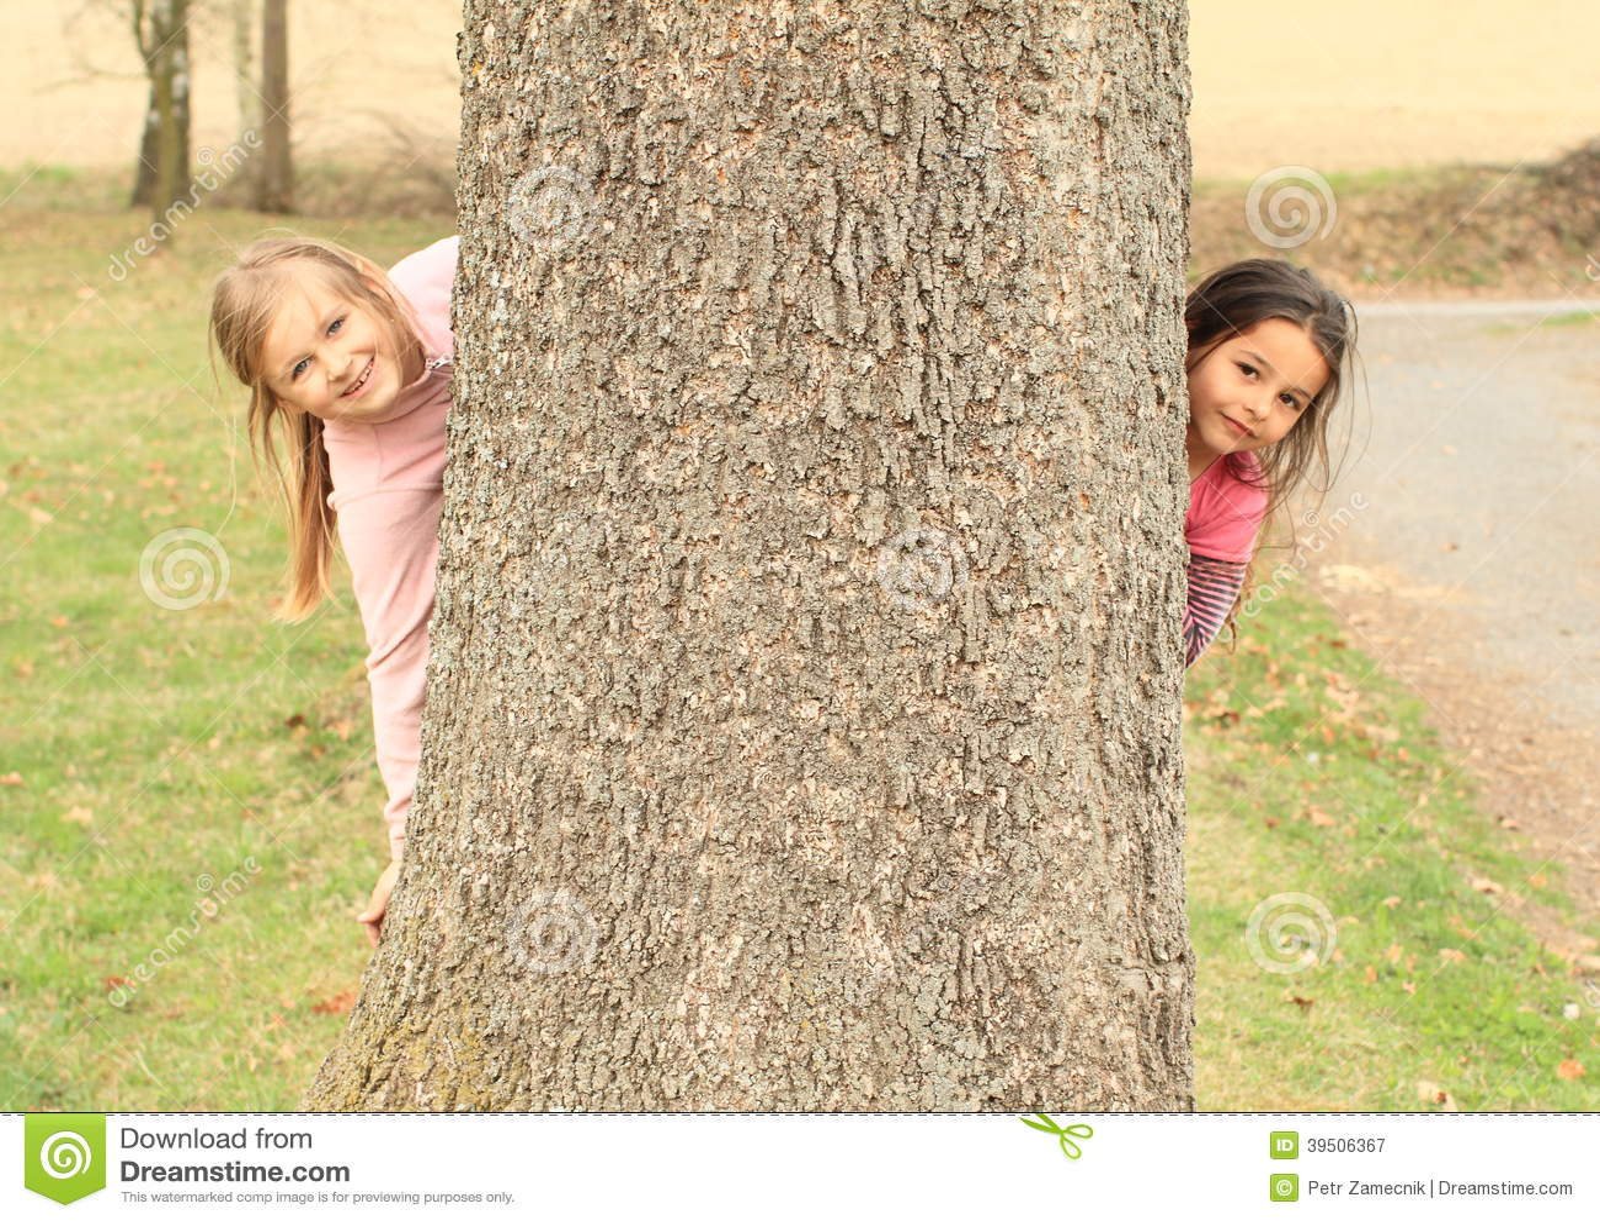 Smiling girls hiding behind tree